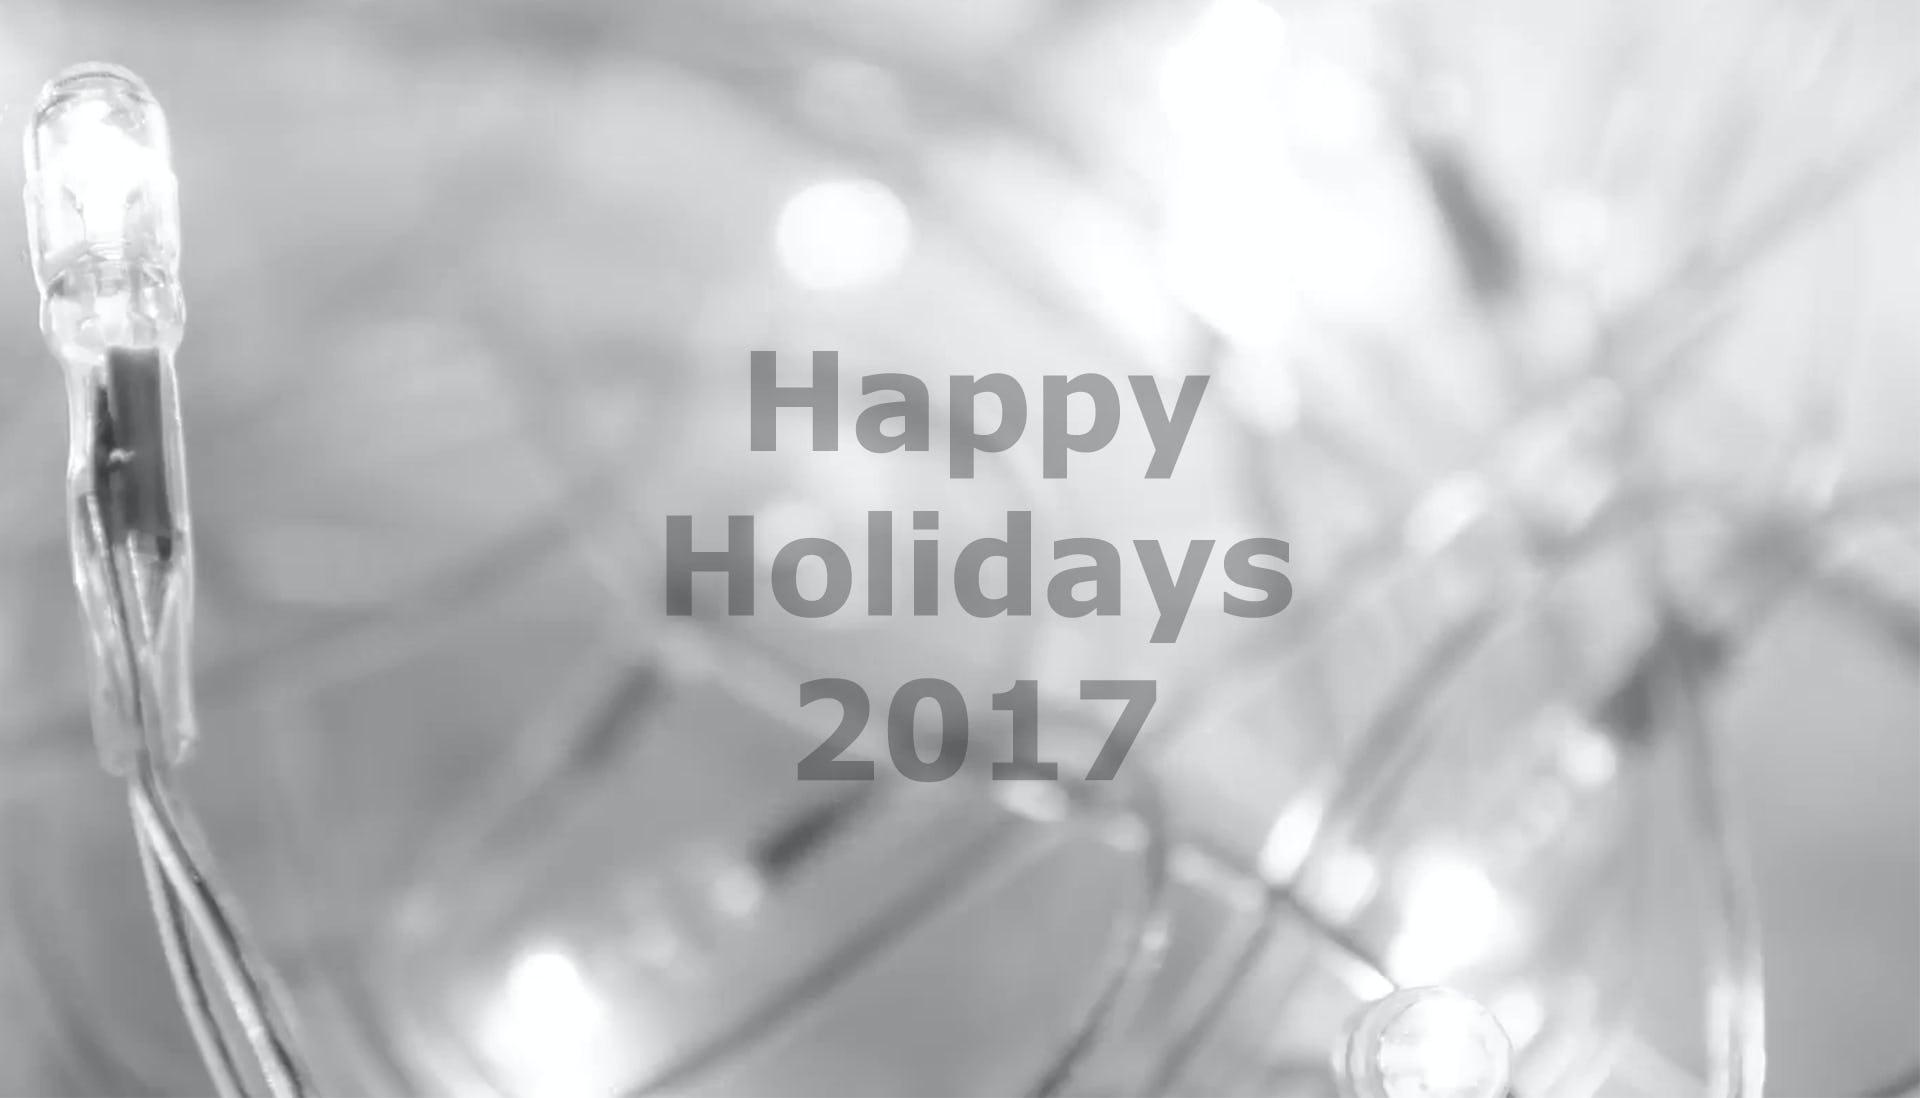 Happy holidays from rim 2017 thumbnail website